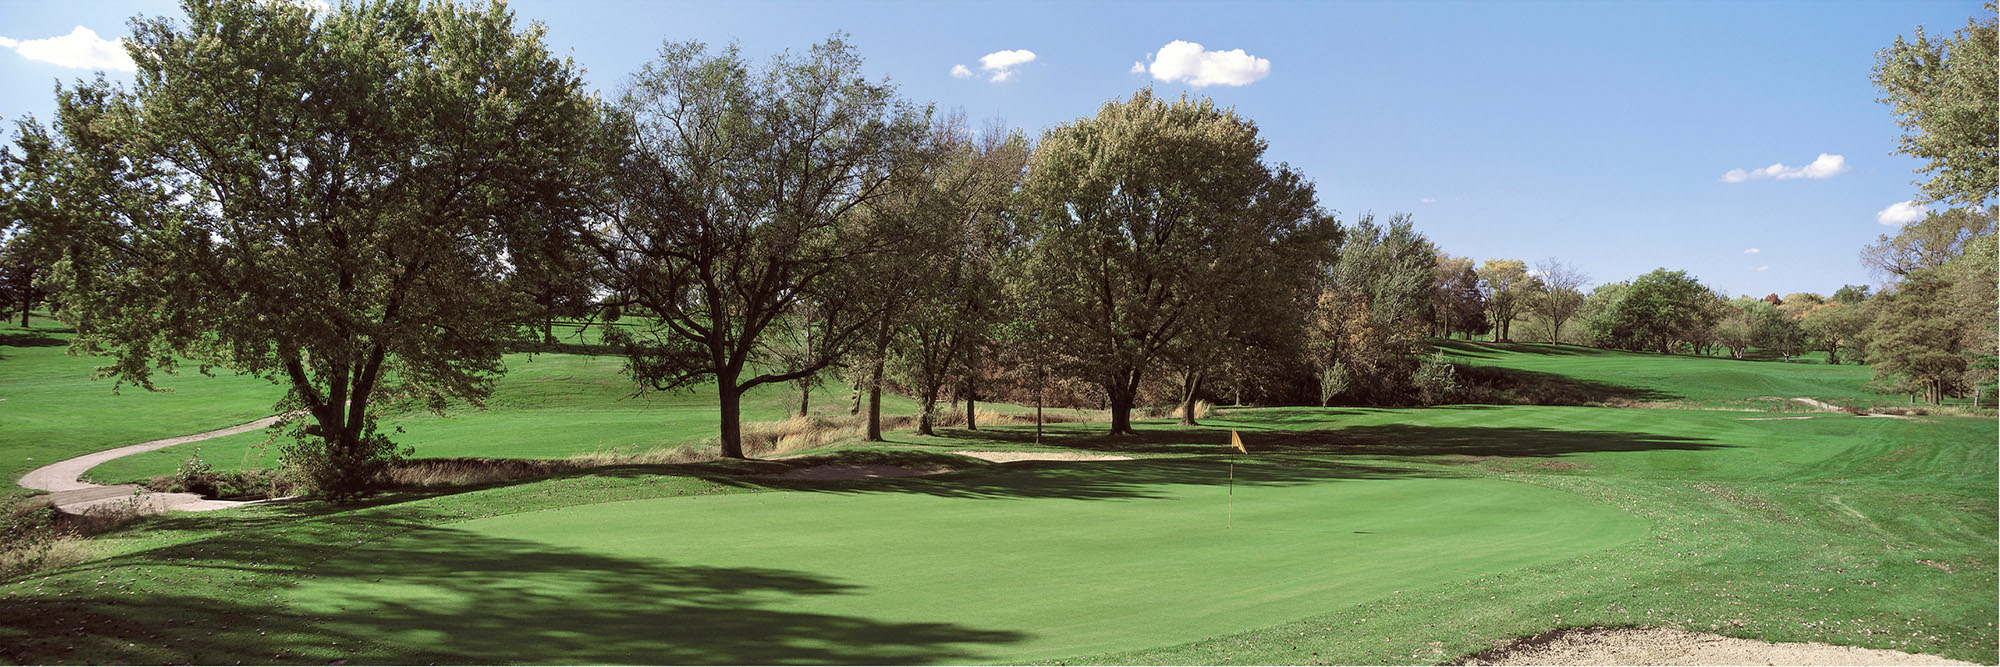 Golf Course Image - Beatrice No. 12